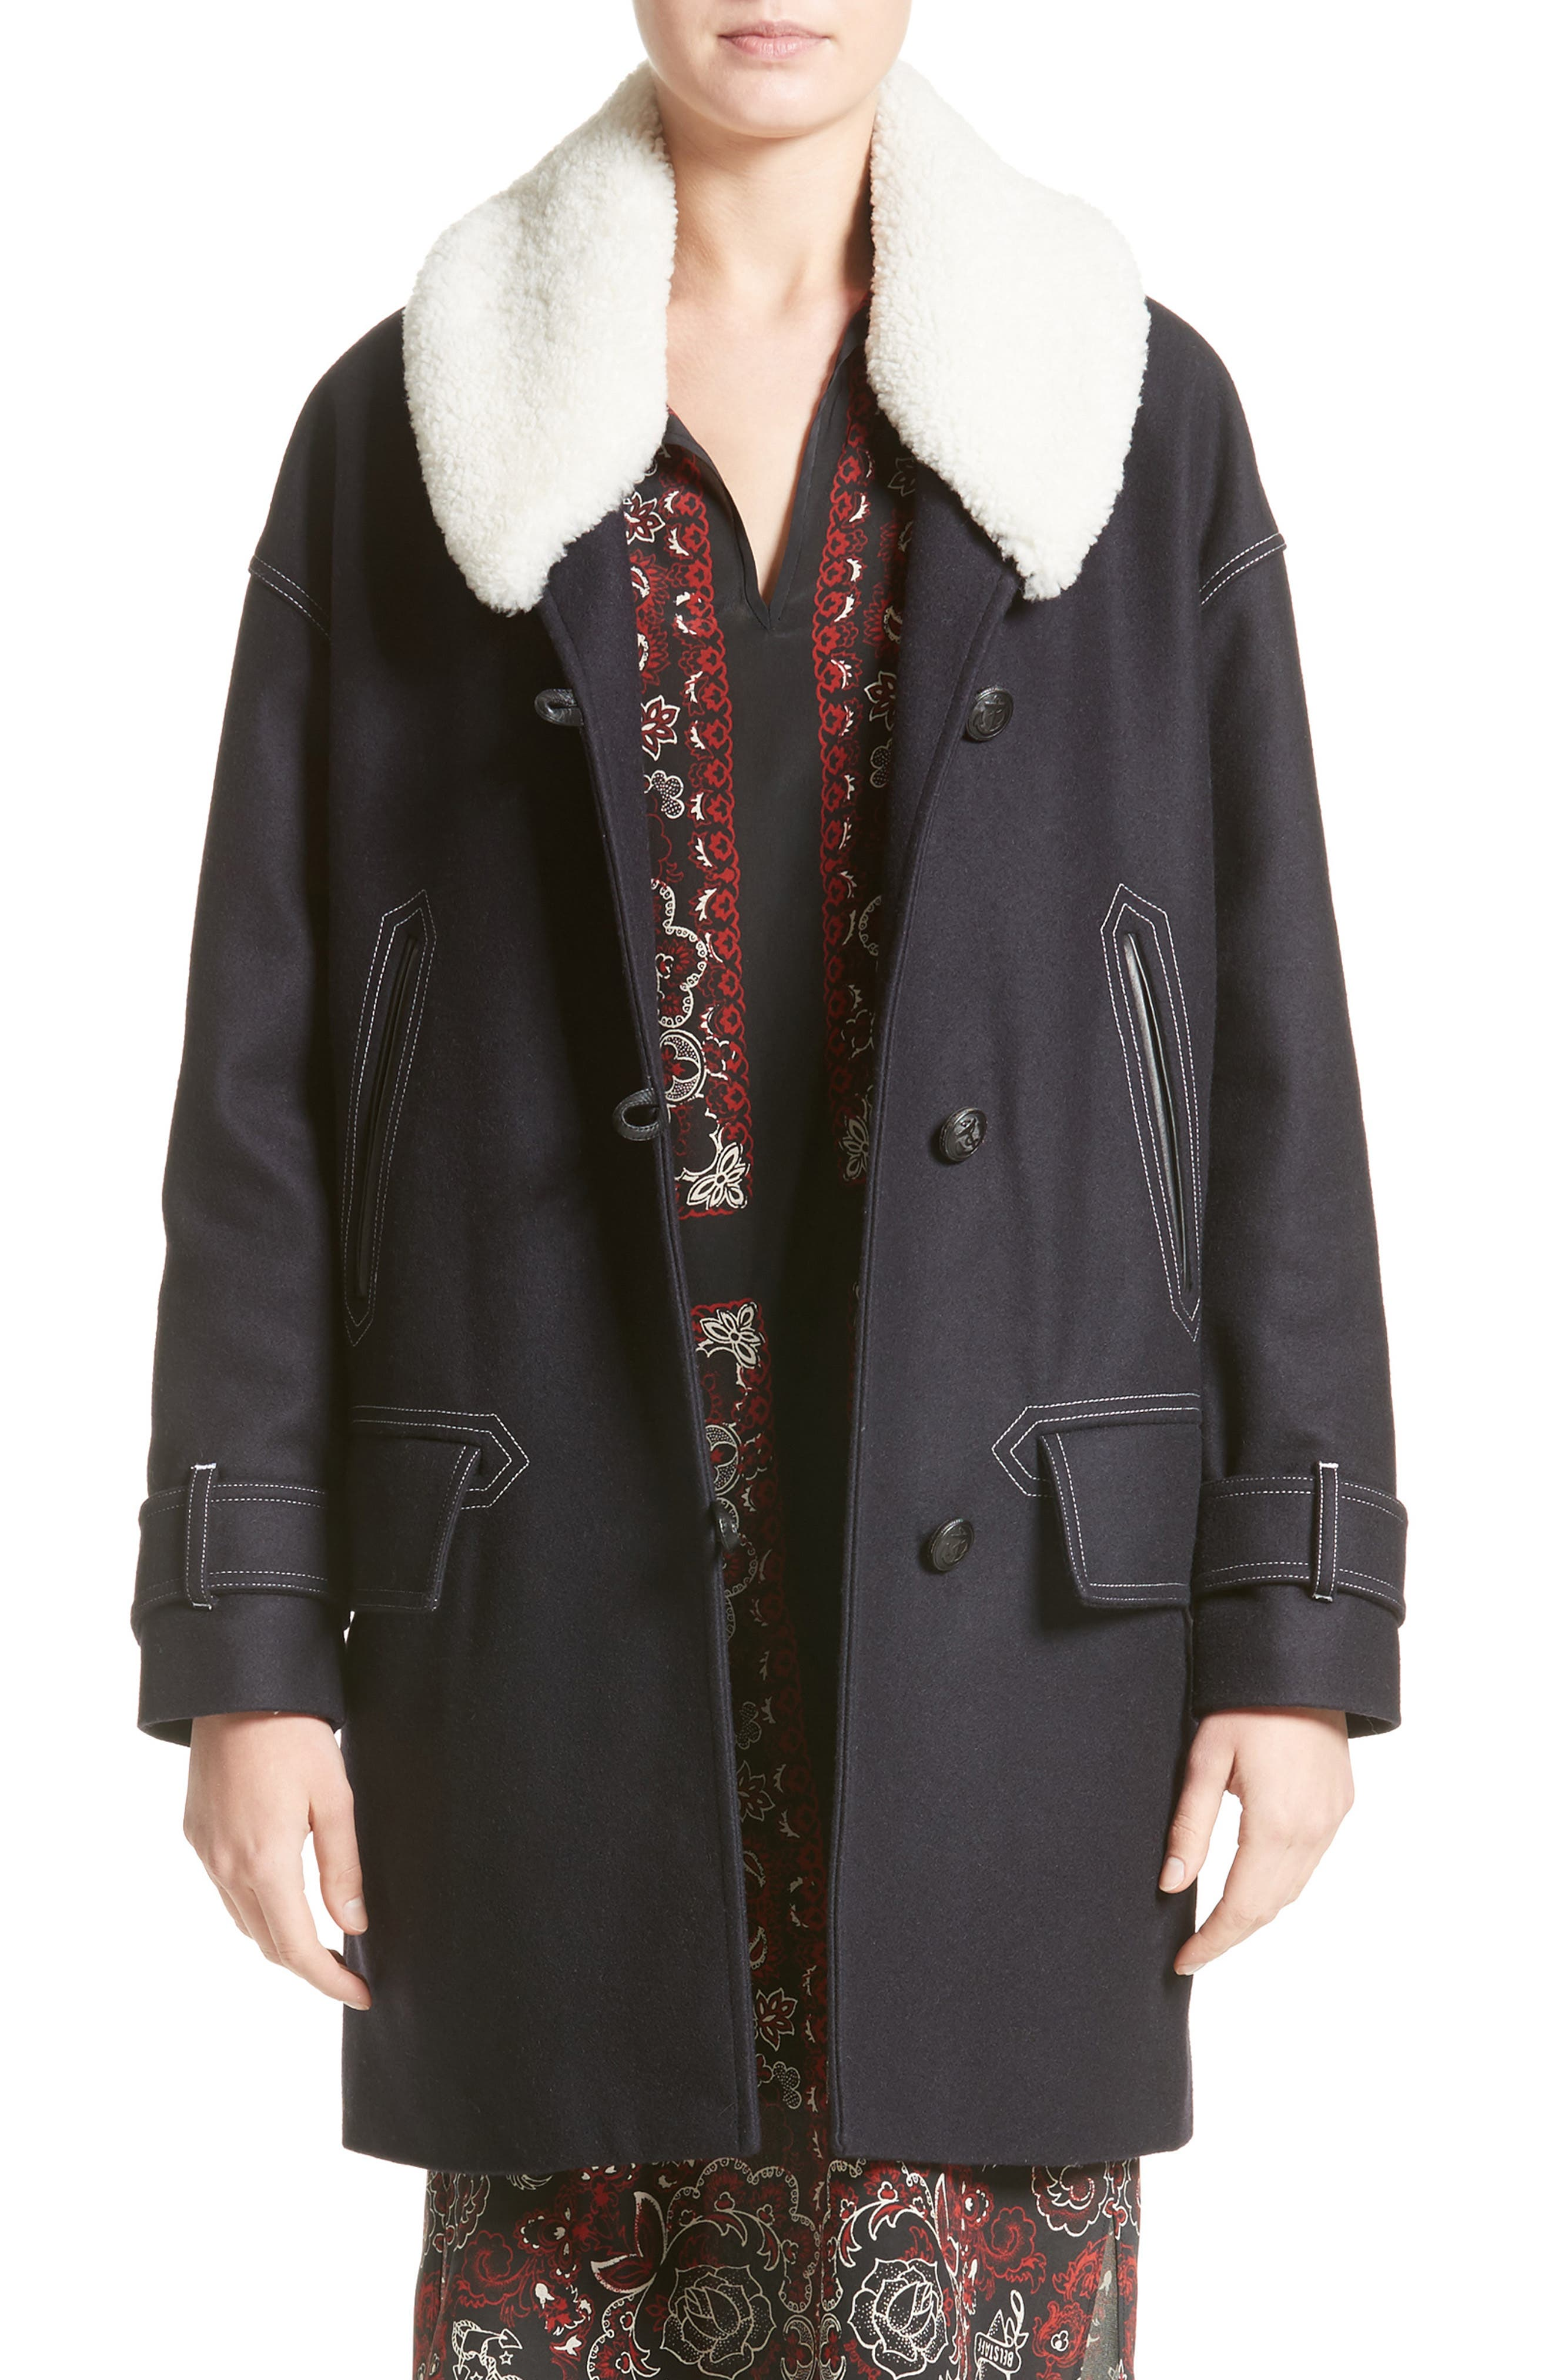 Belstaff Apsley Genuine Shearling Collar Wool Blend Coat